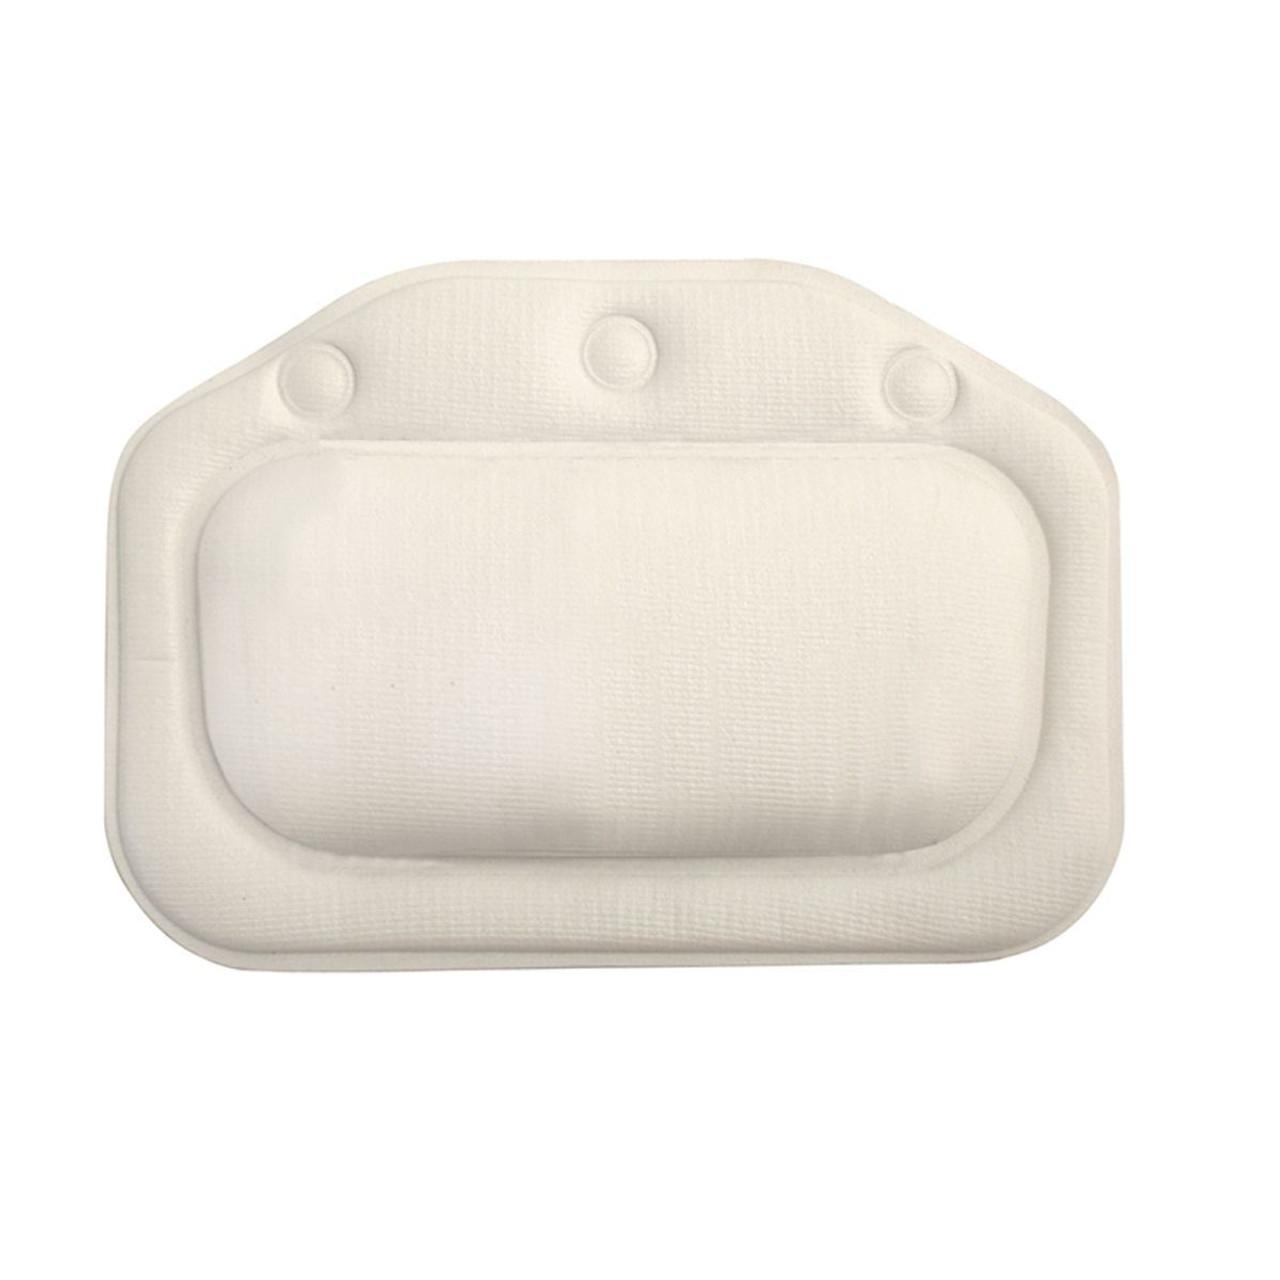 Croydex White Bath Pillow